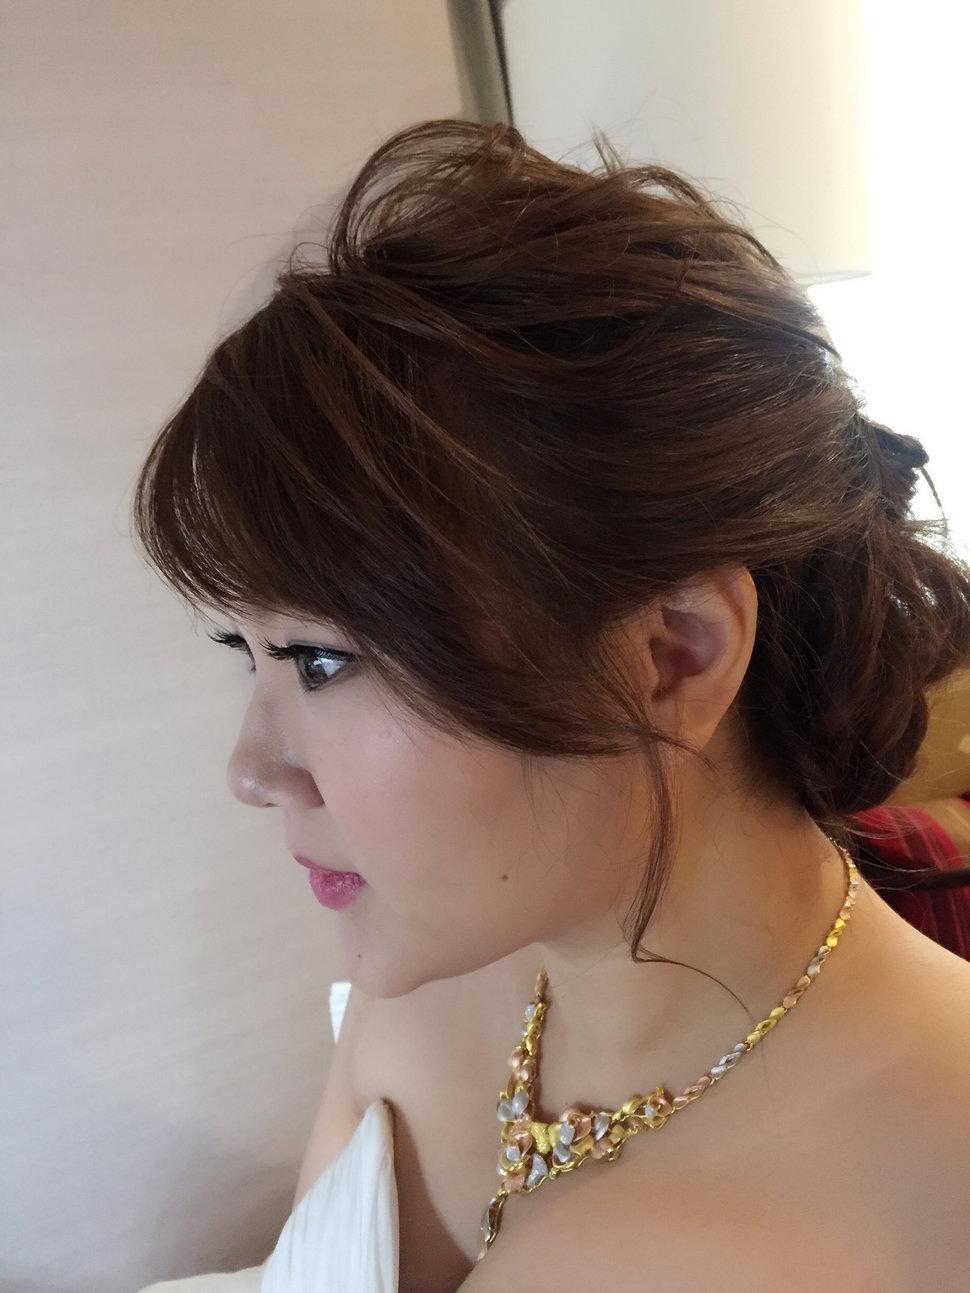 IMG_4564 - Jojo chen Makeup新娘秘書《結婚吧》